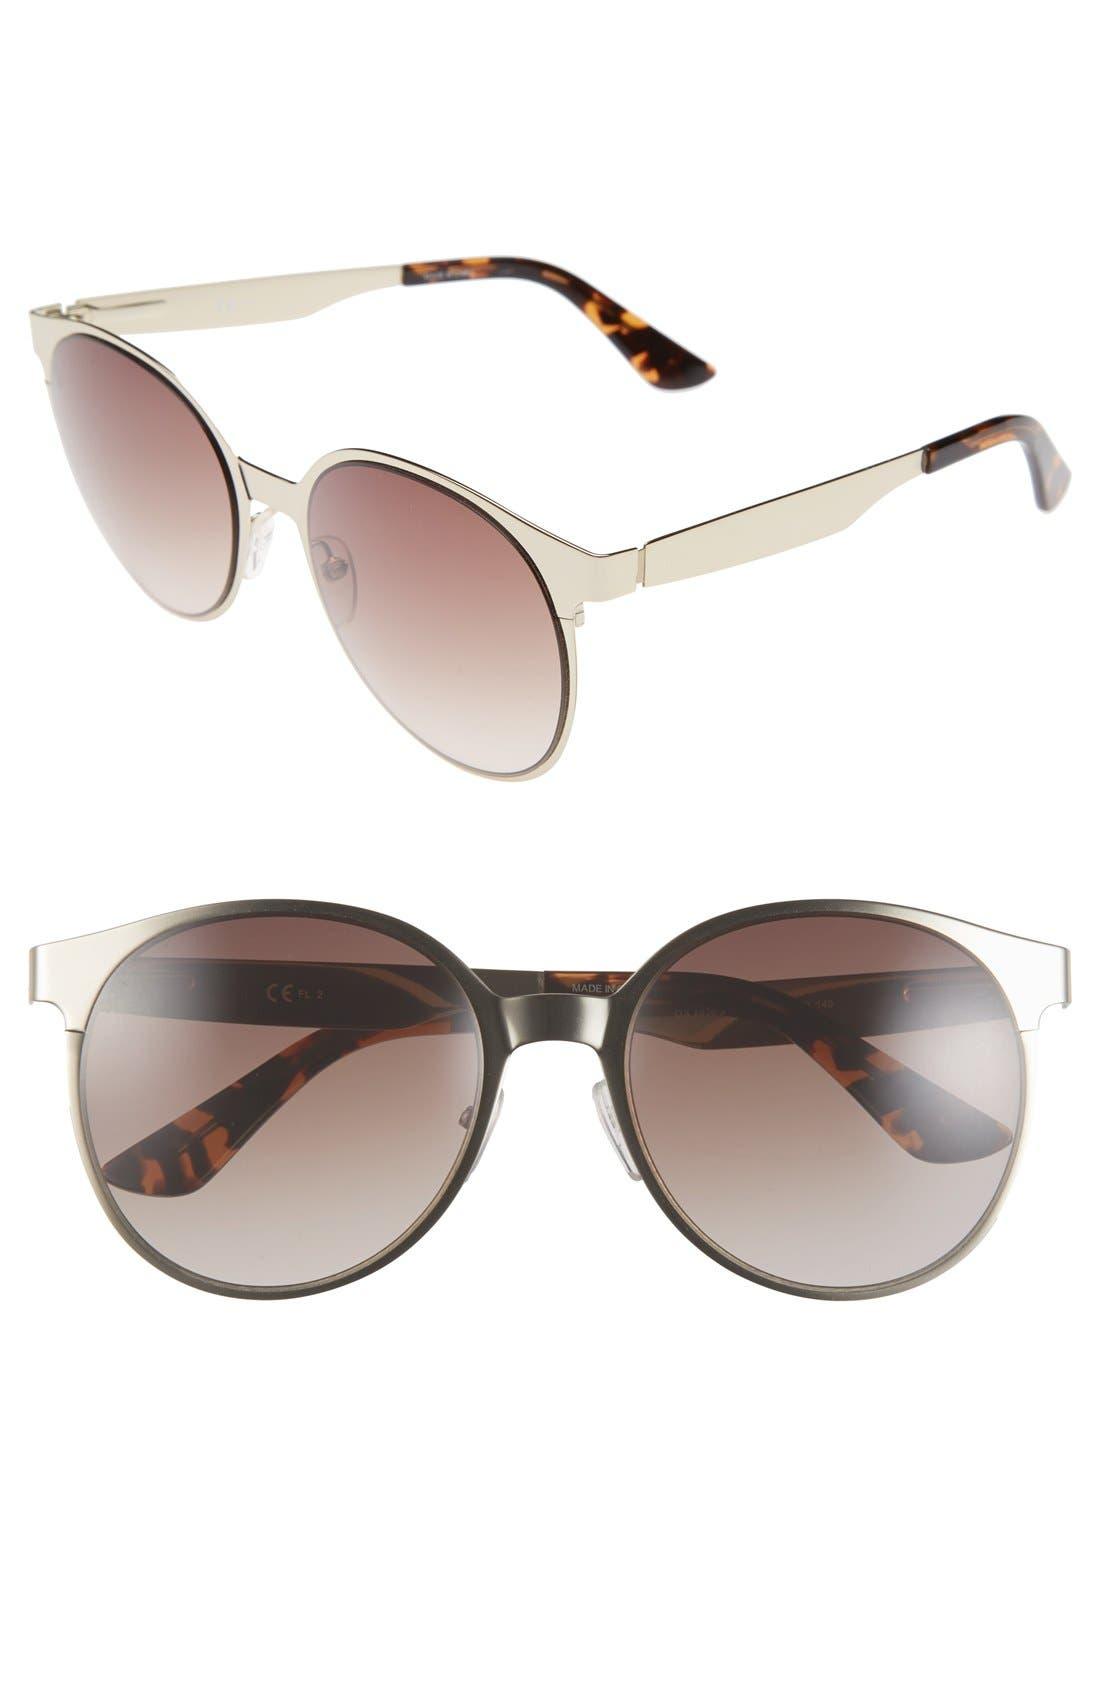 Main Image - Oxydo 54mm Retro Sunglasses